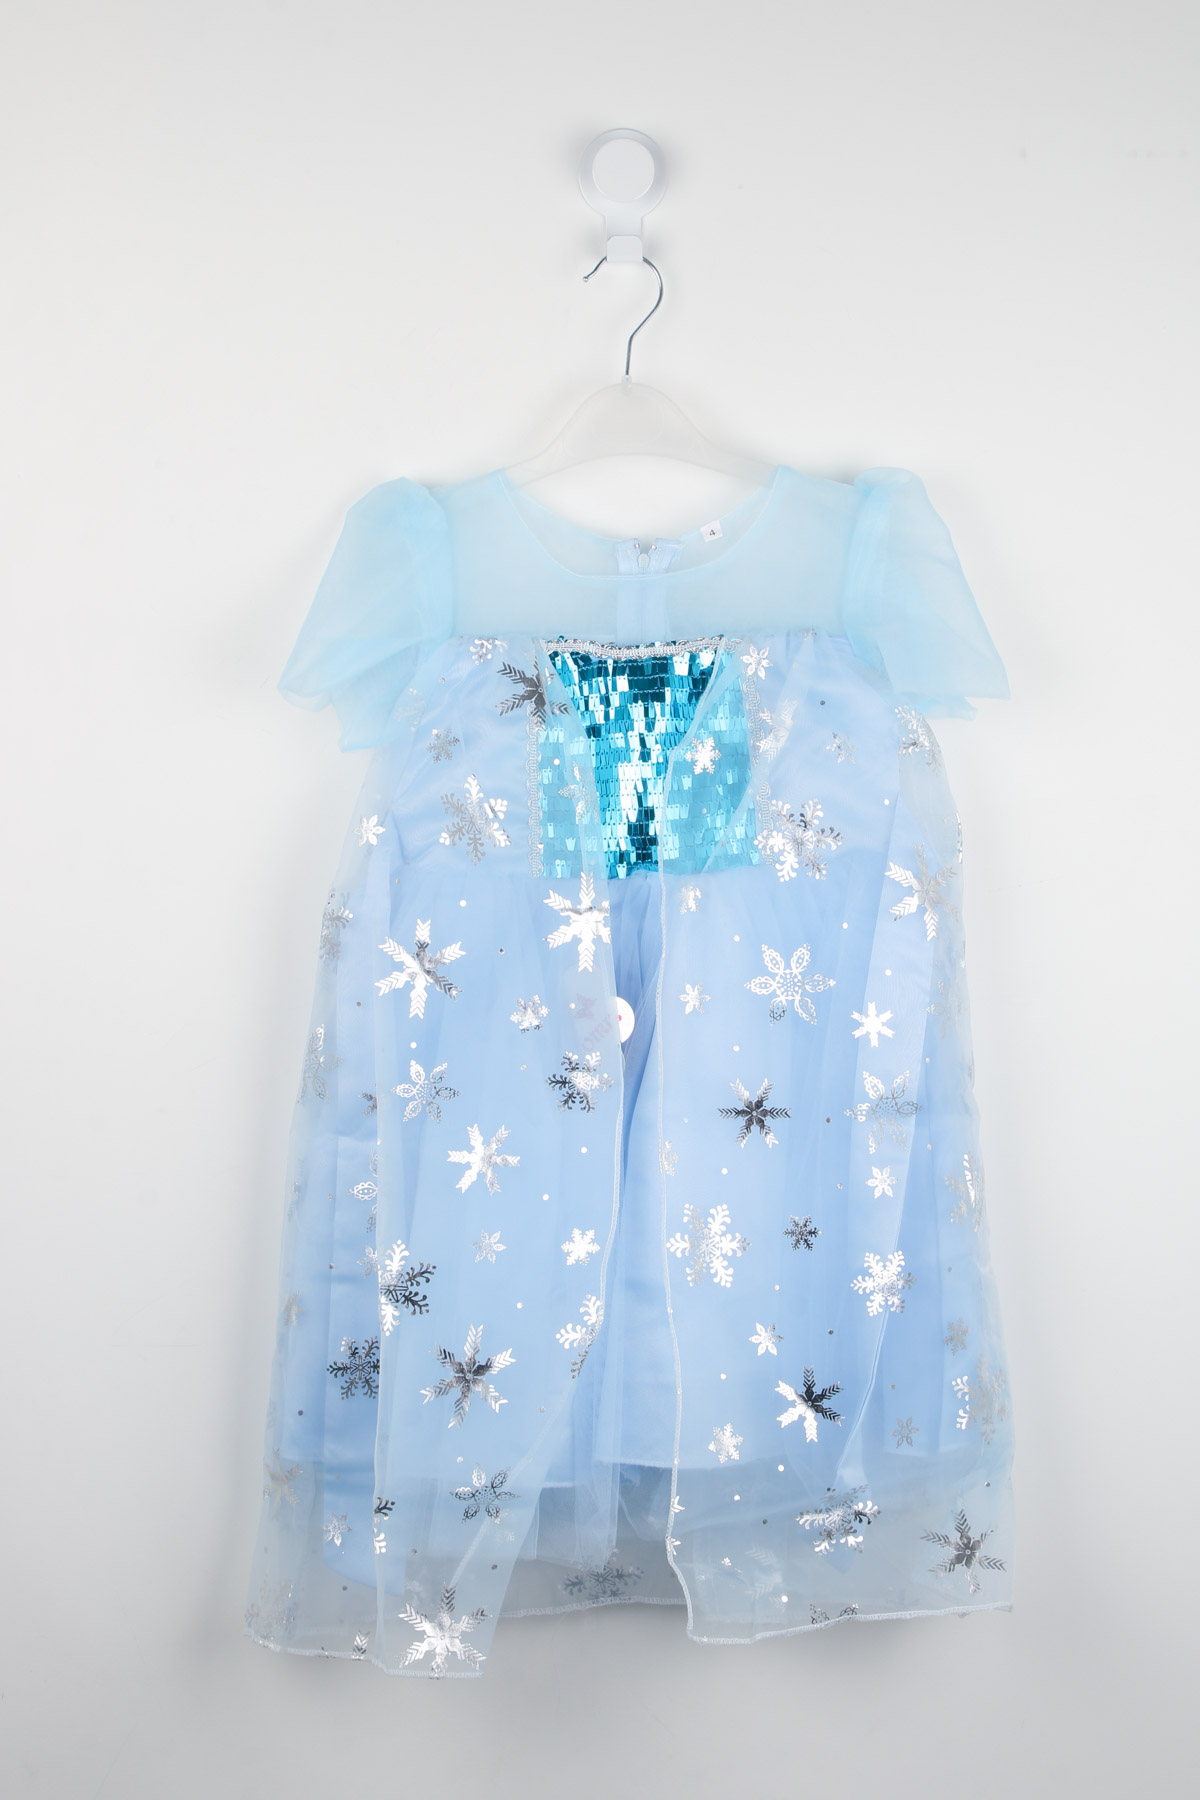 Robes Enfant Bleu MON AMI 888 #c eFashion Paris